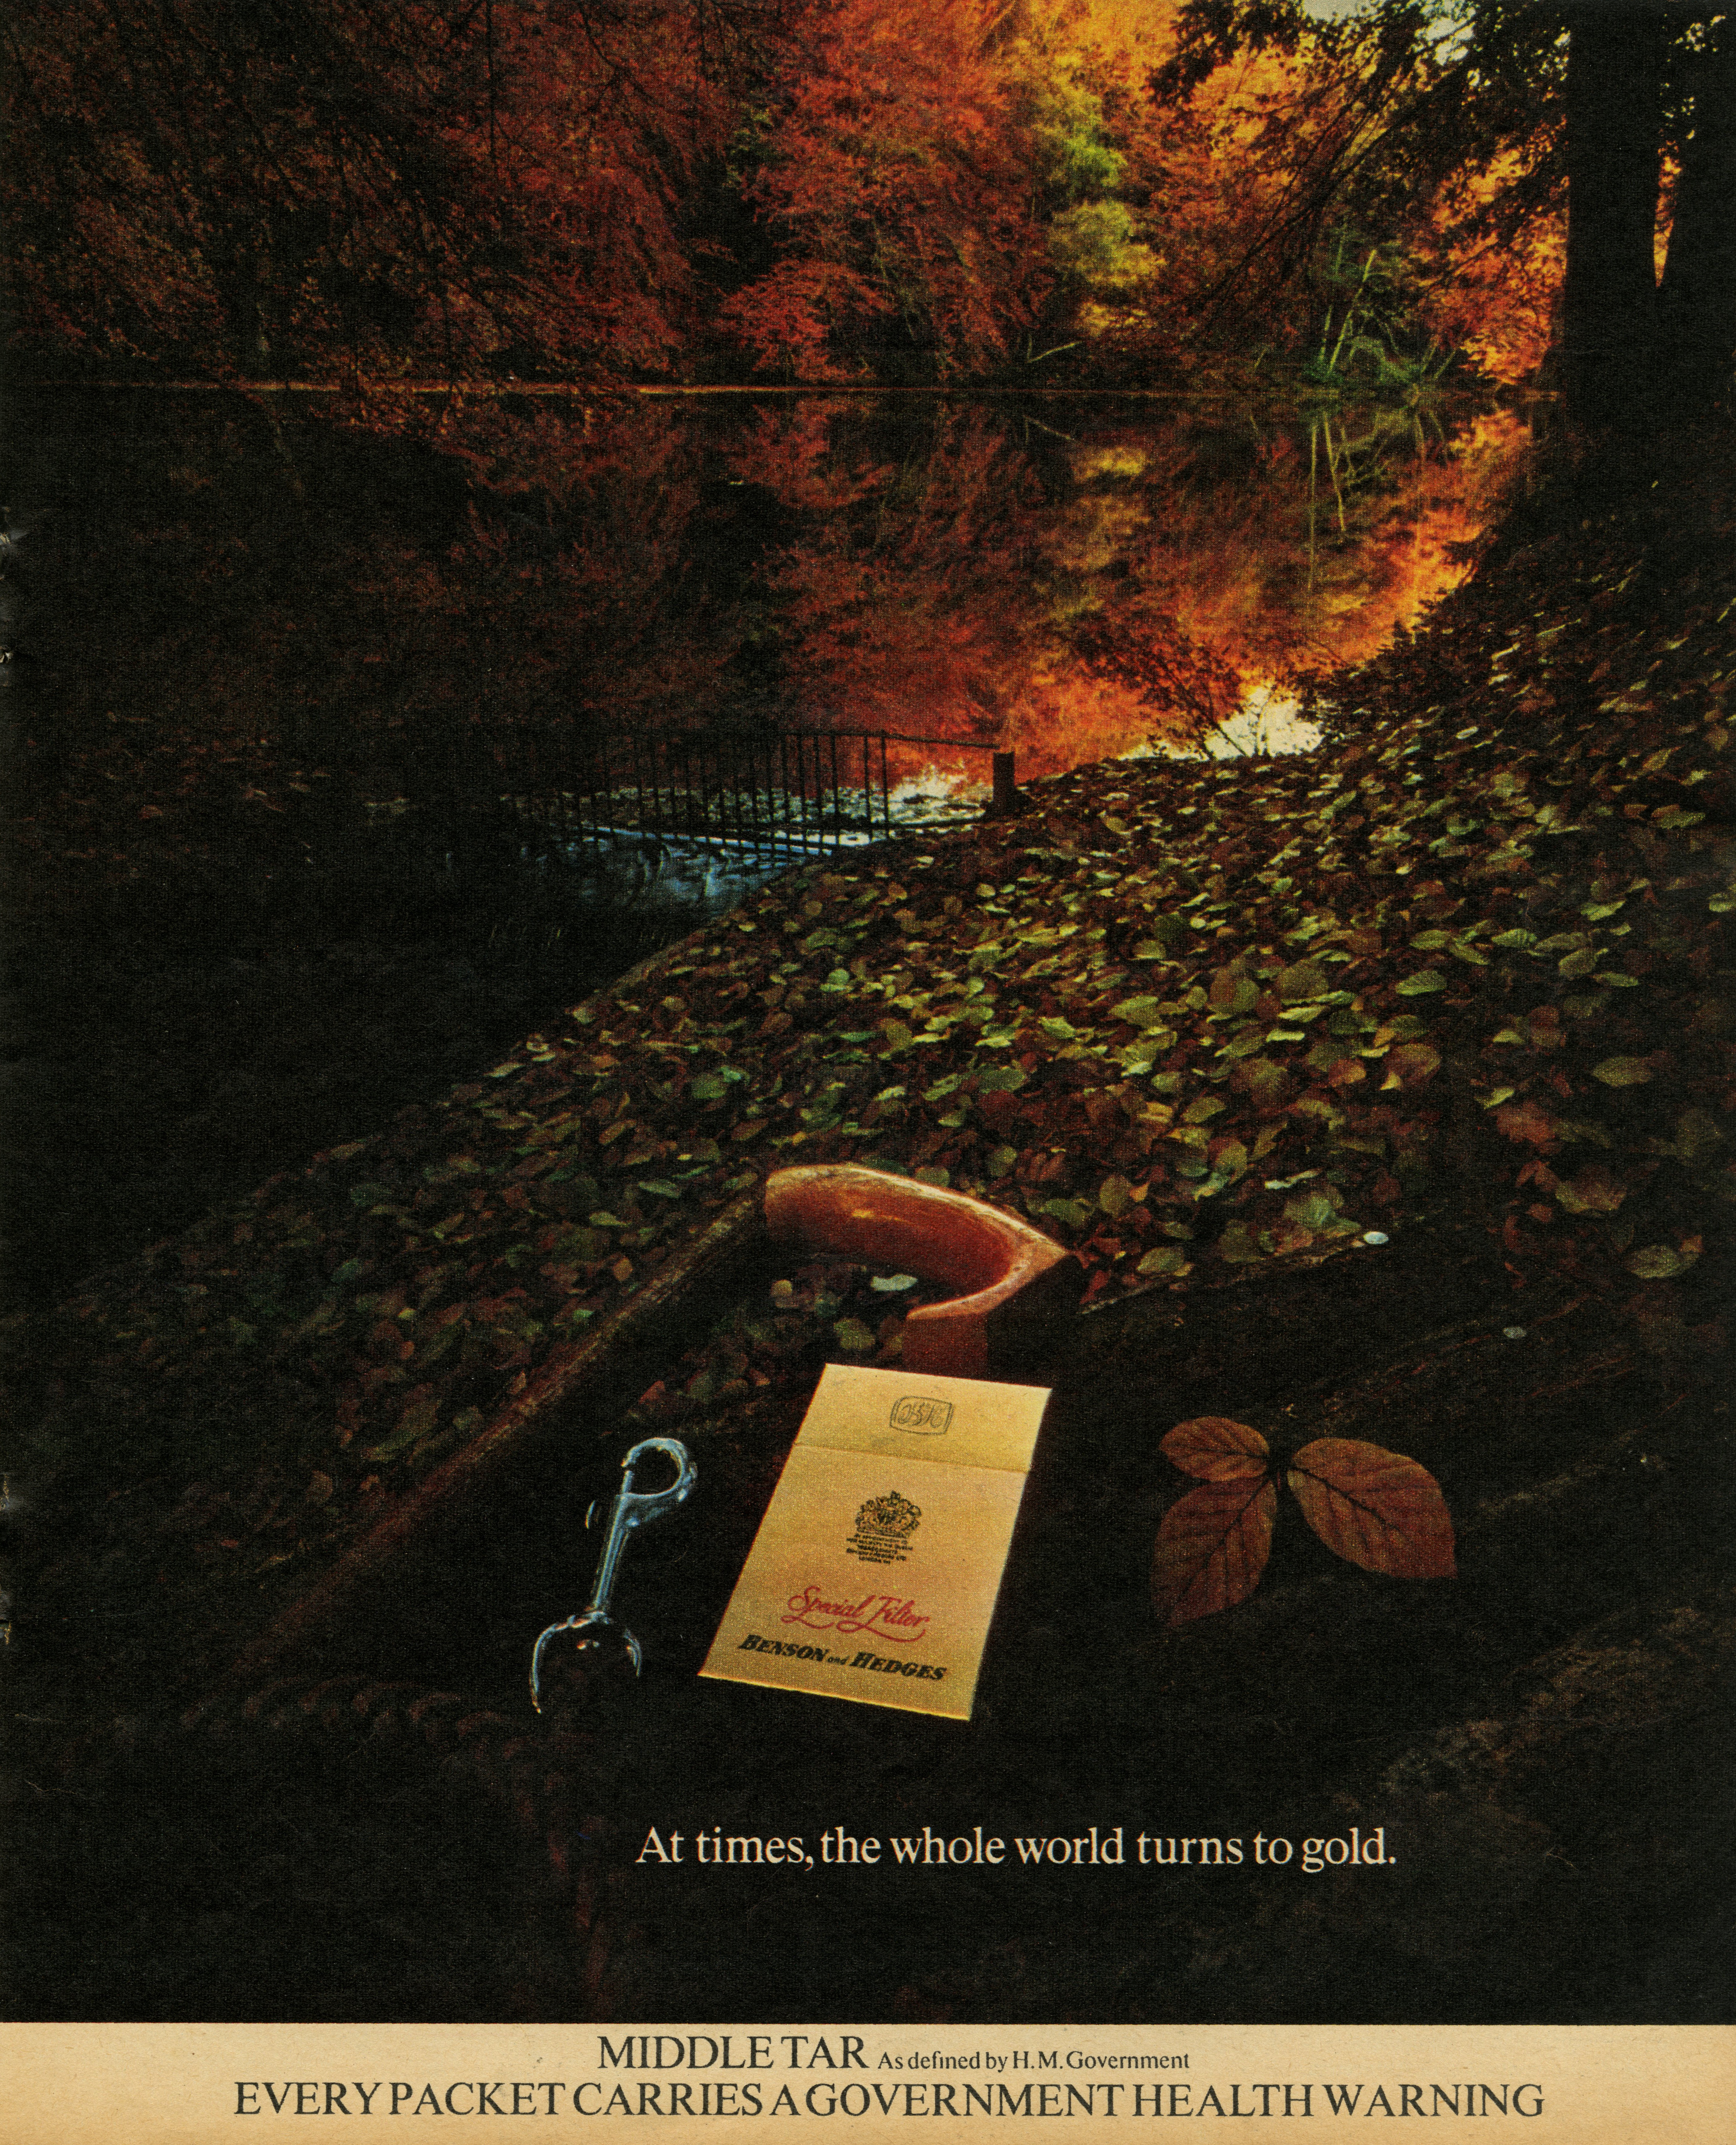 B&H Gold Box - 'Autumn Leaves', CDP-01